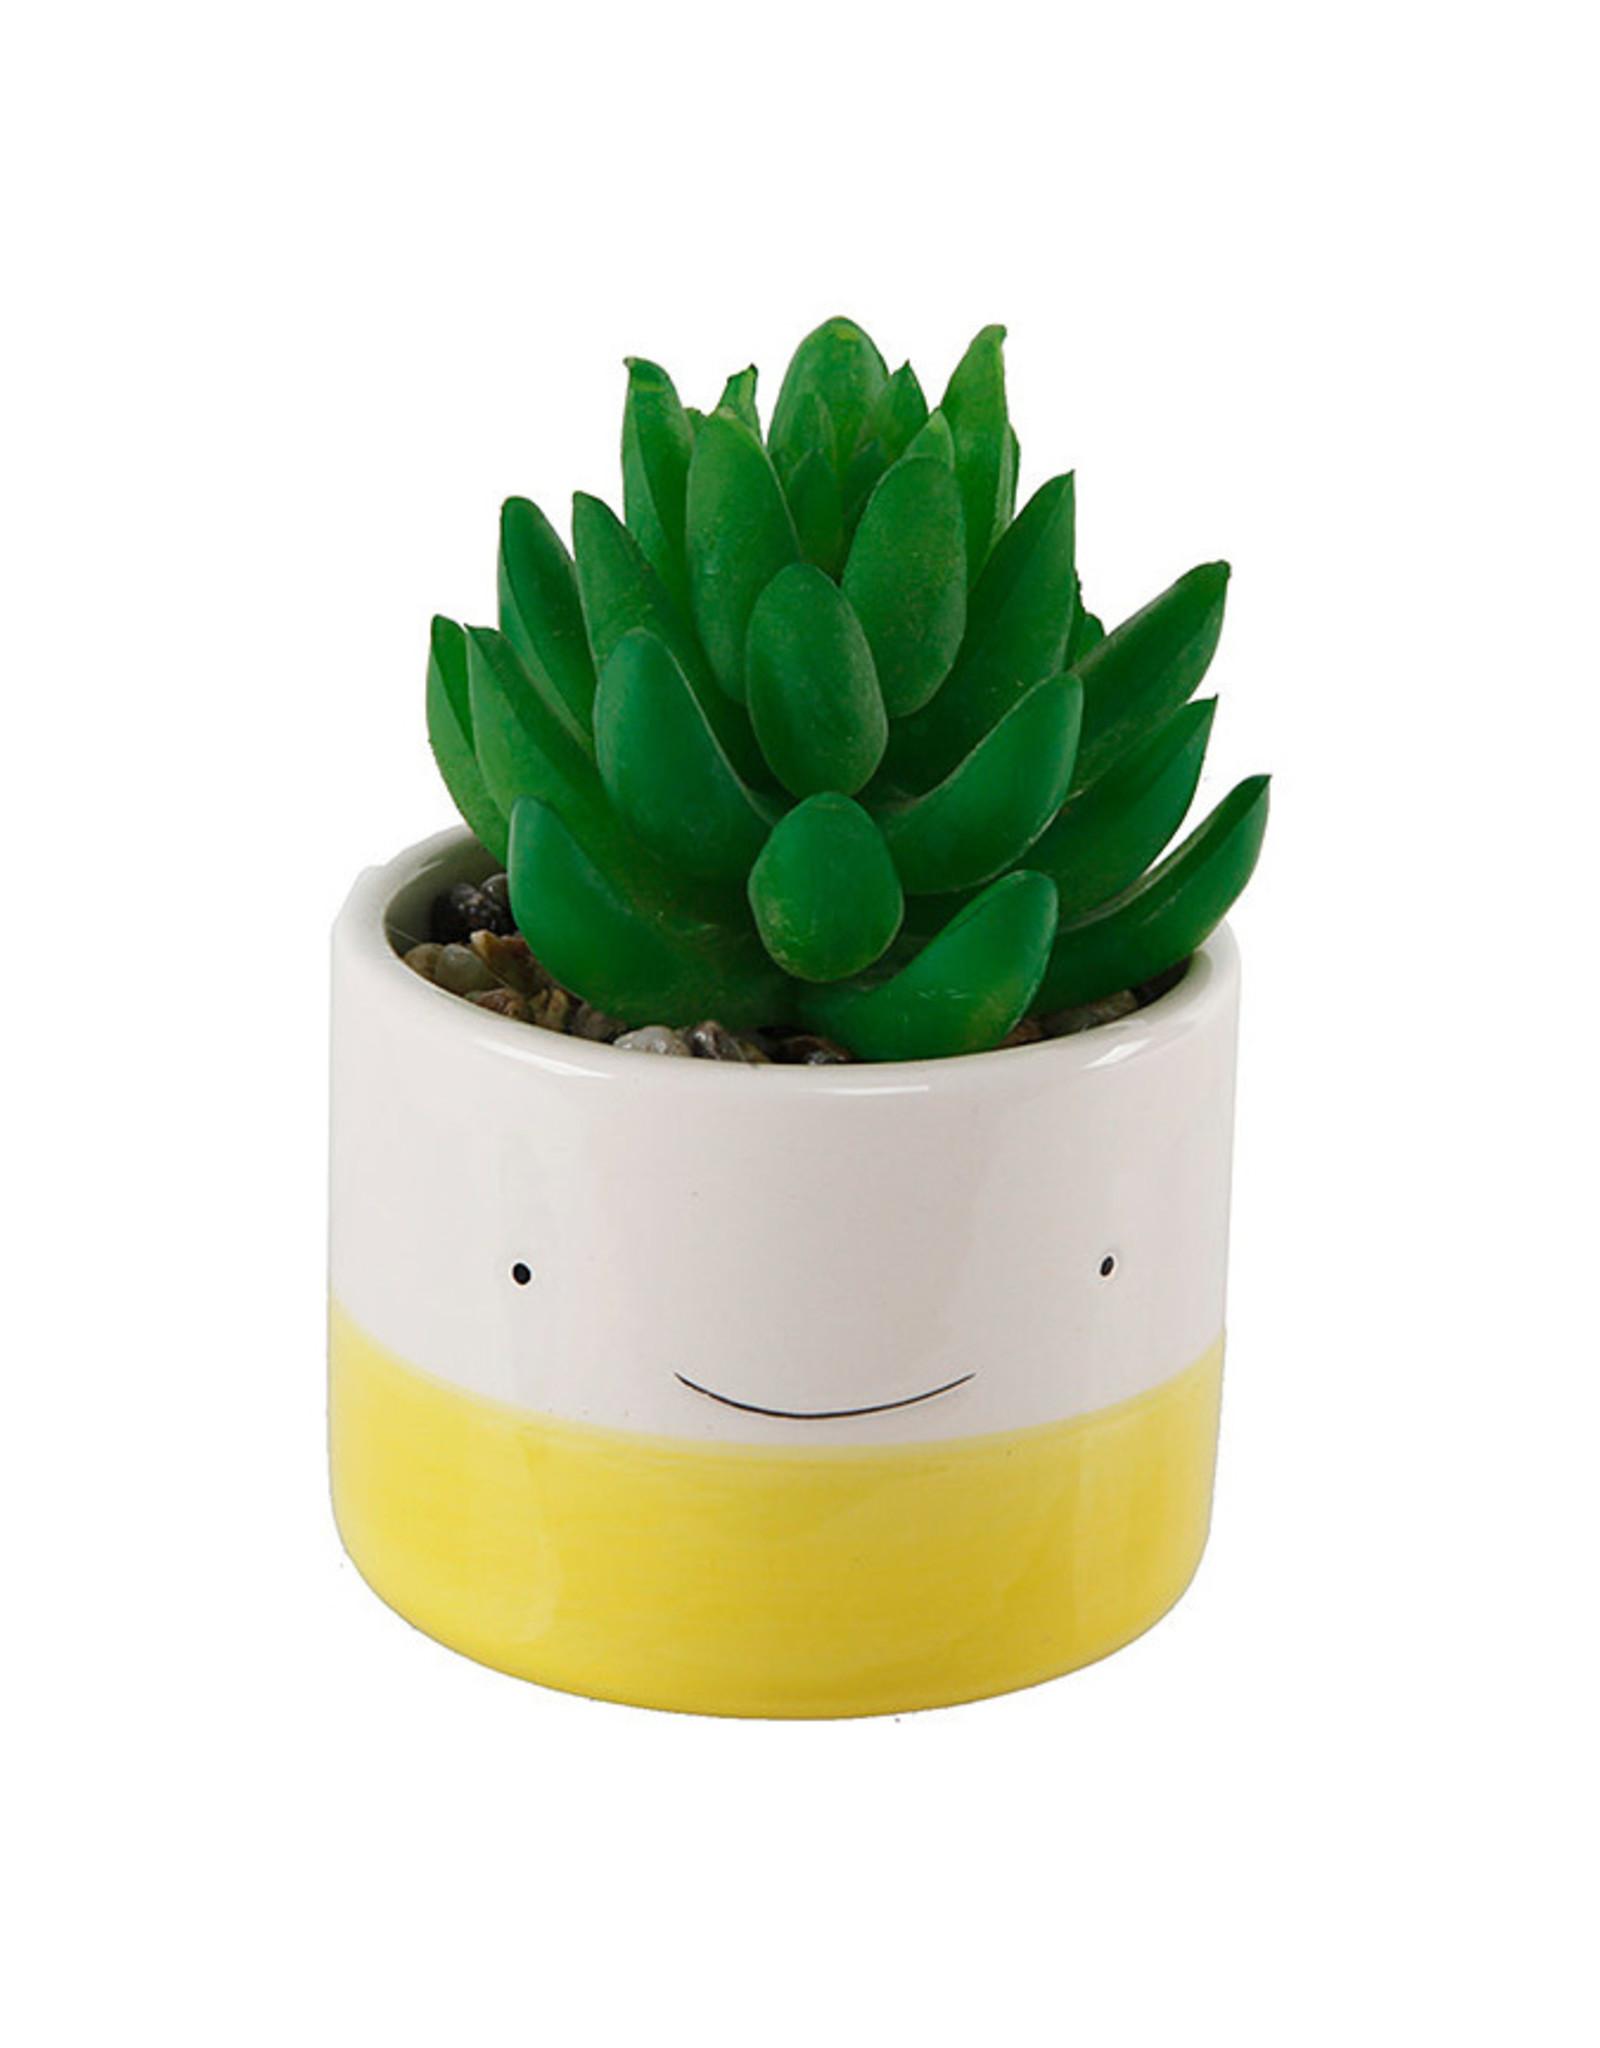 Smiley Face Succulent Planter - Yellow